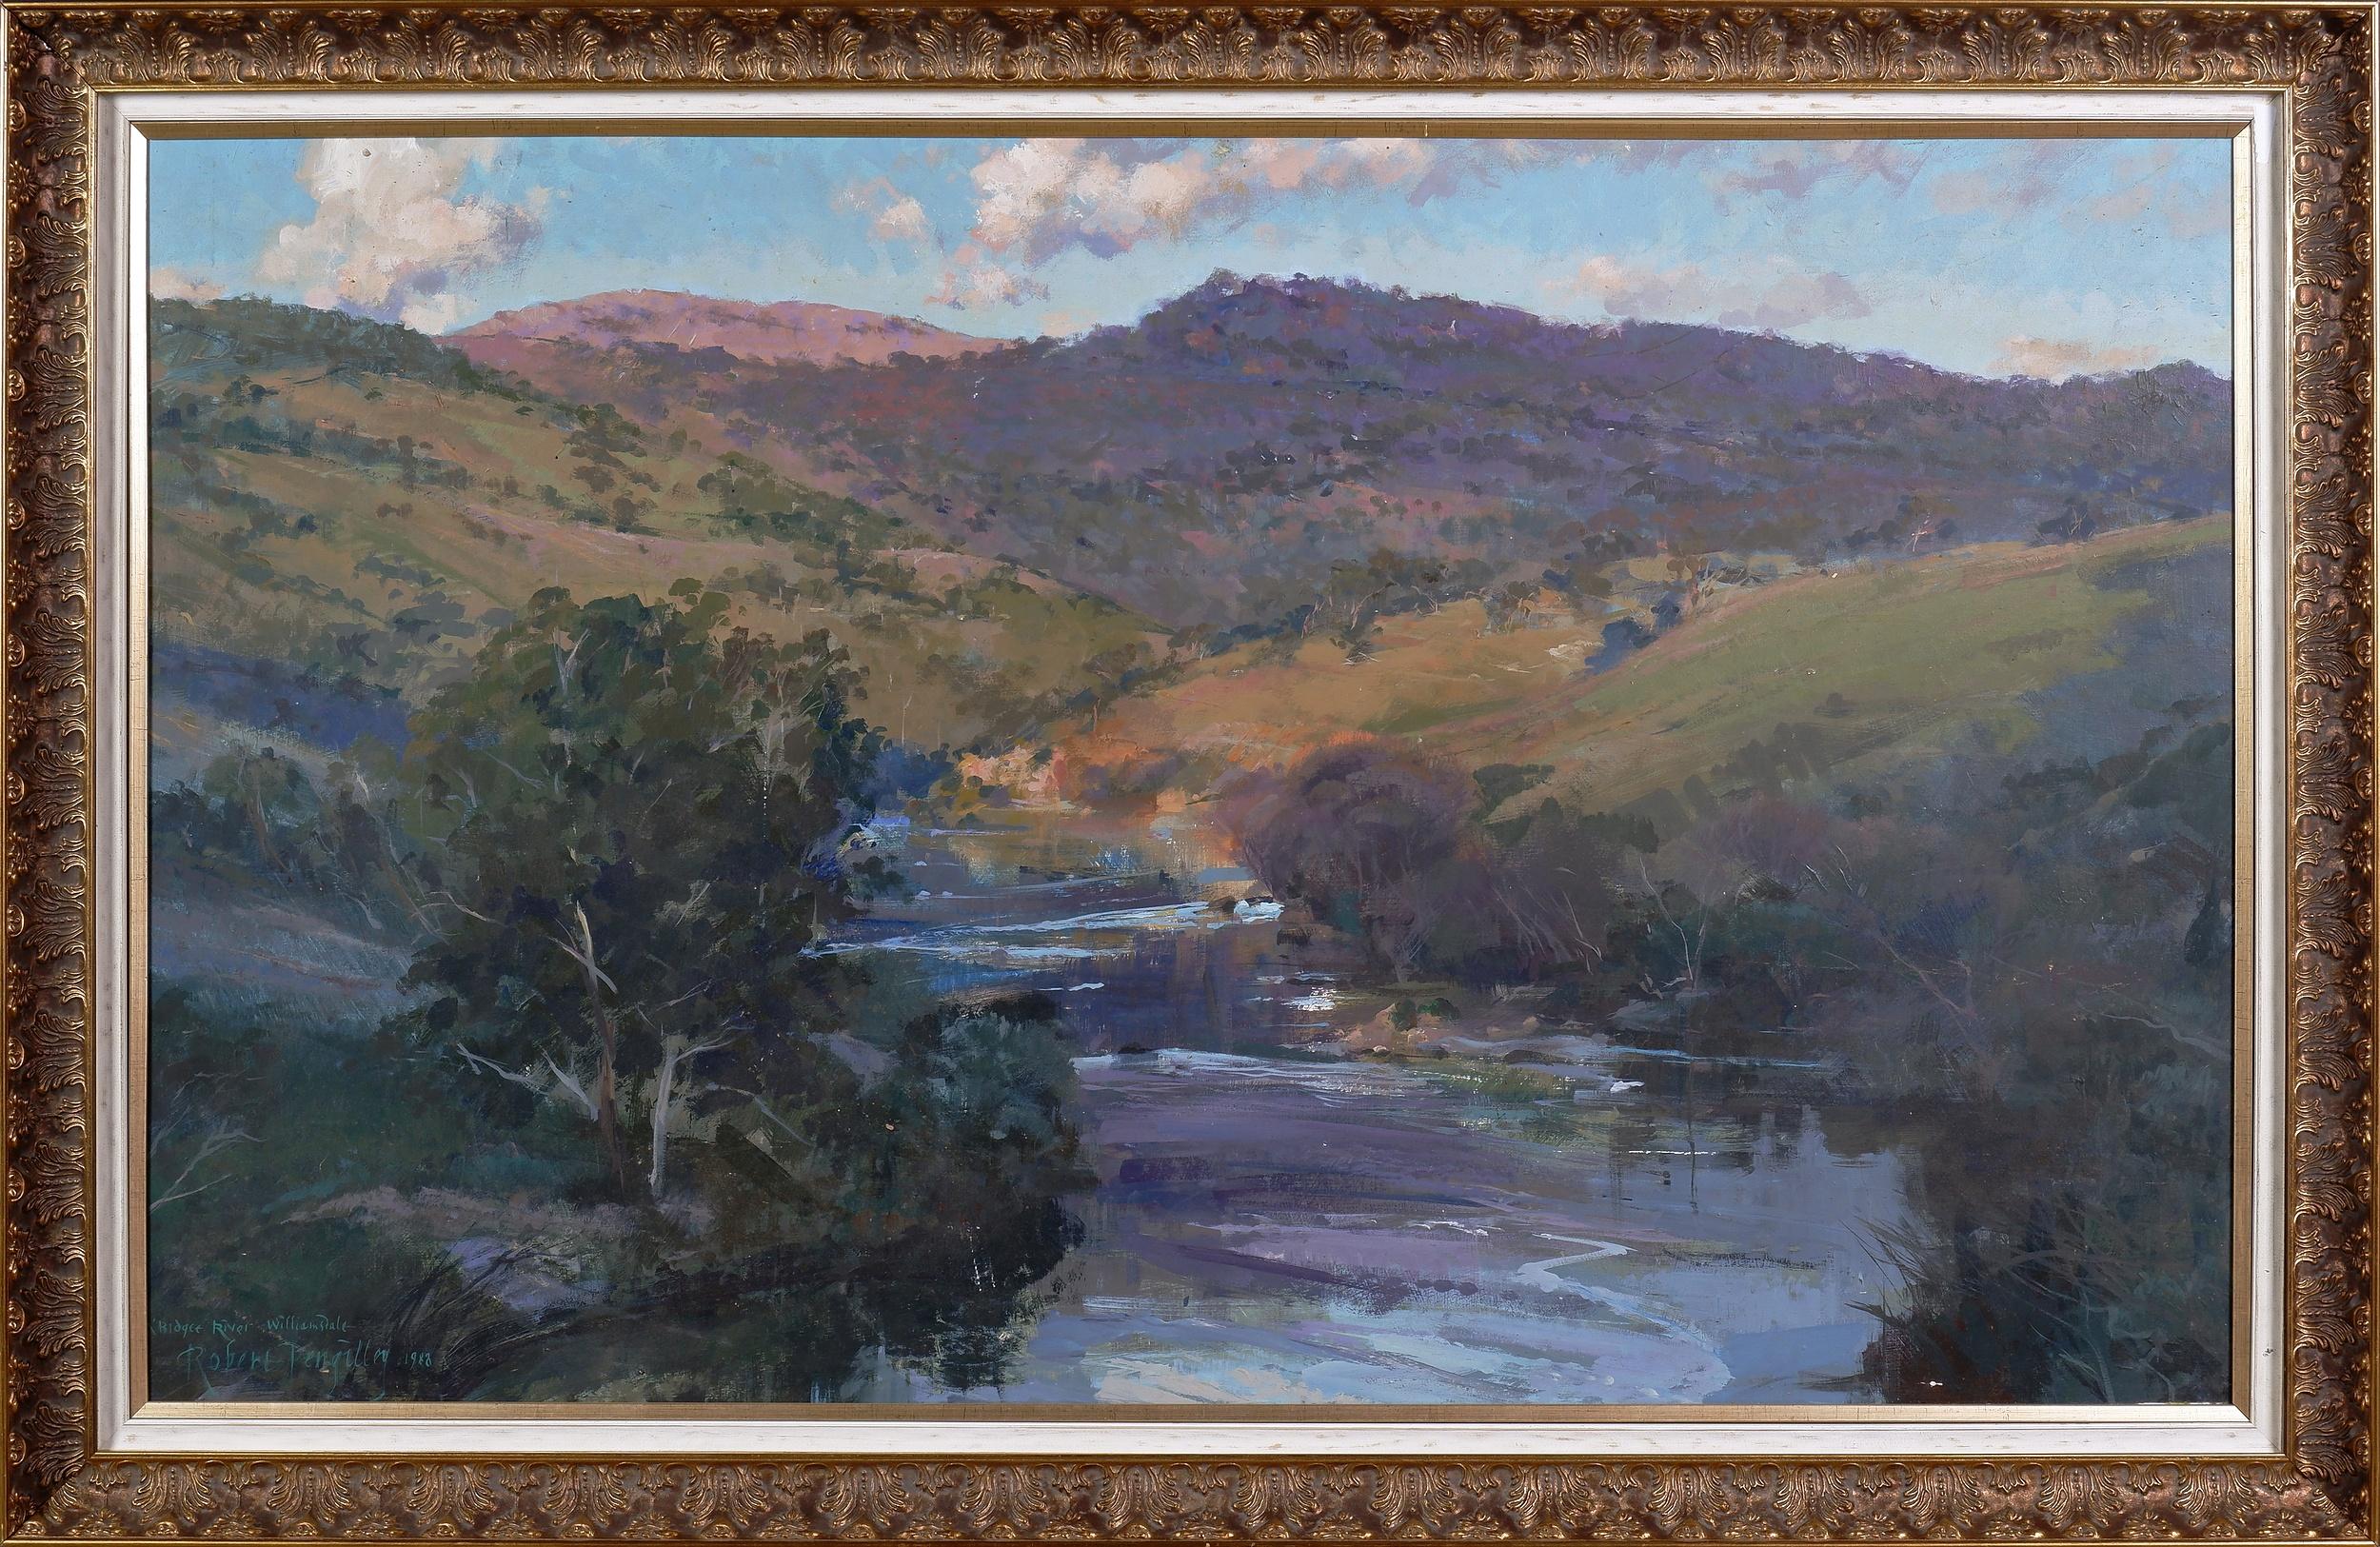 'Robert Pengilley, Murrumbidgee River, Williamsdale, Oil on Board'